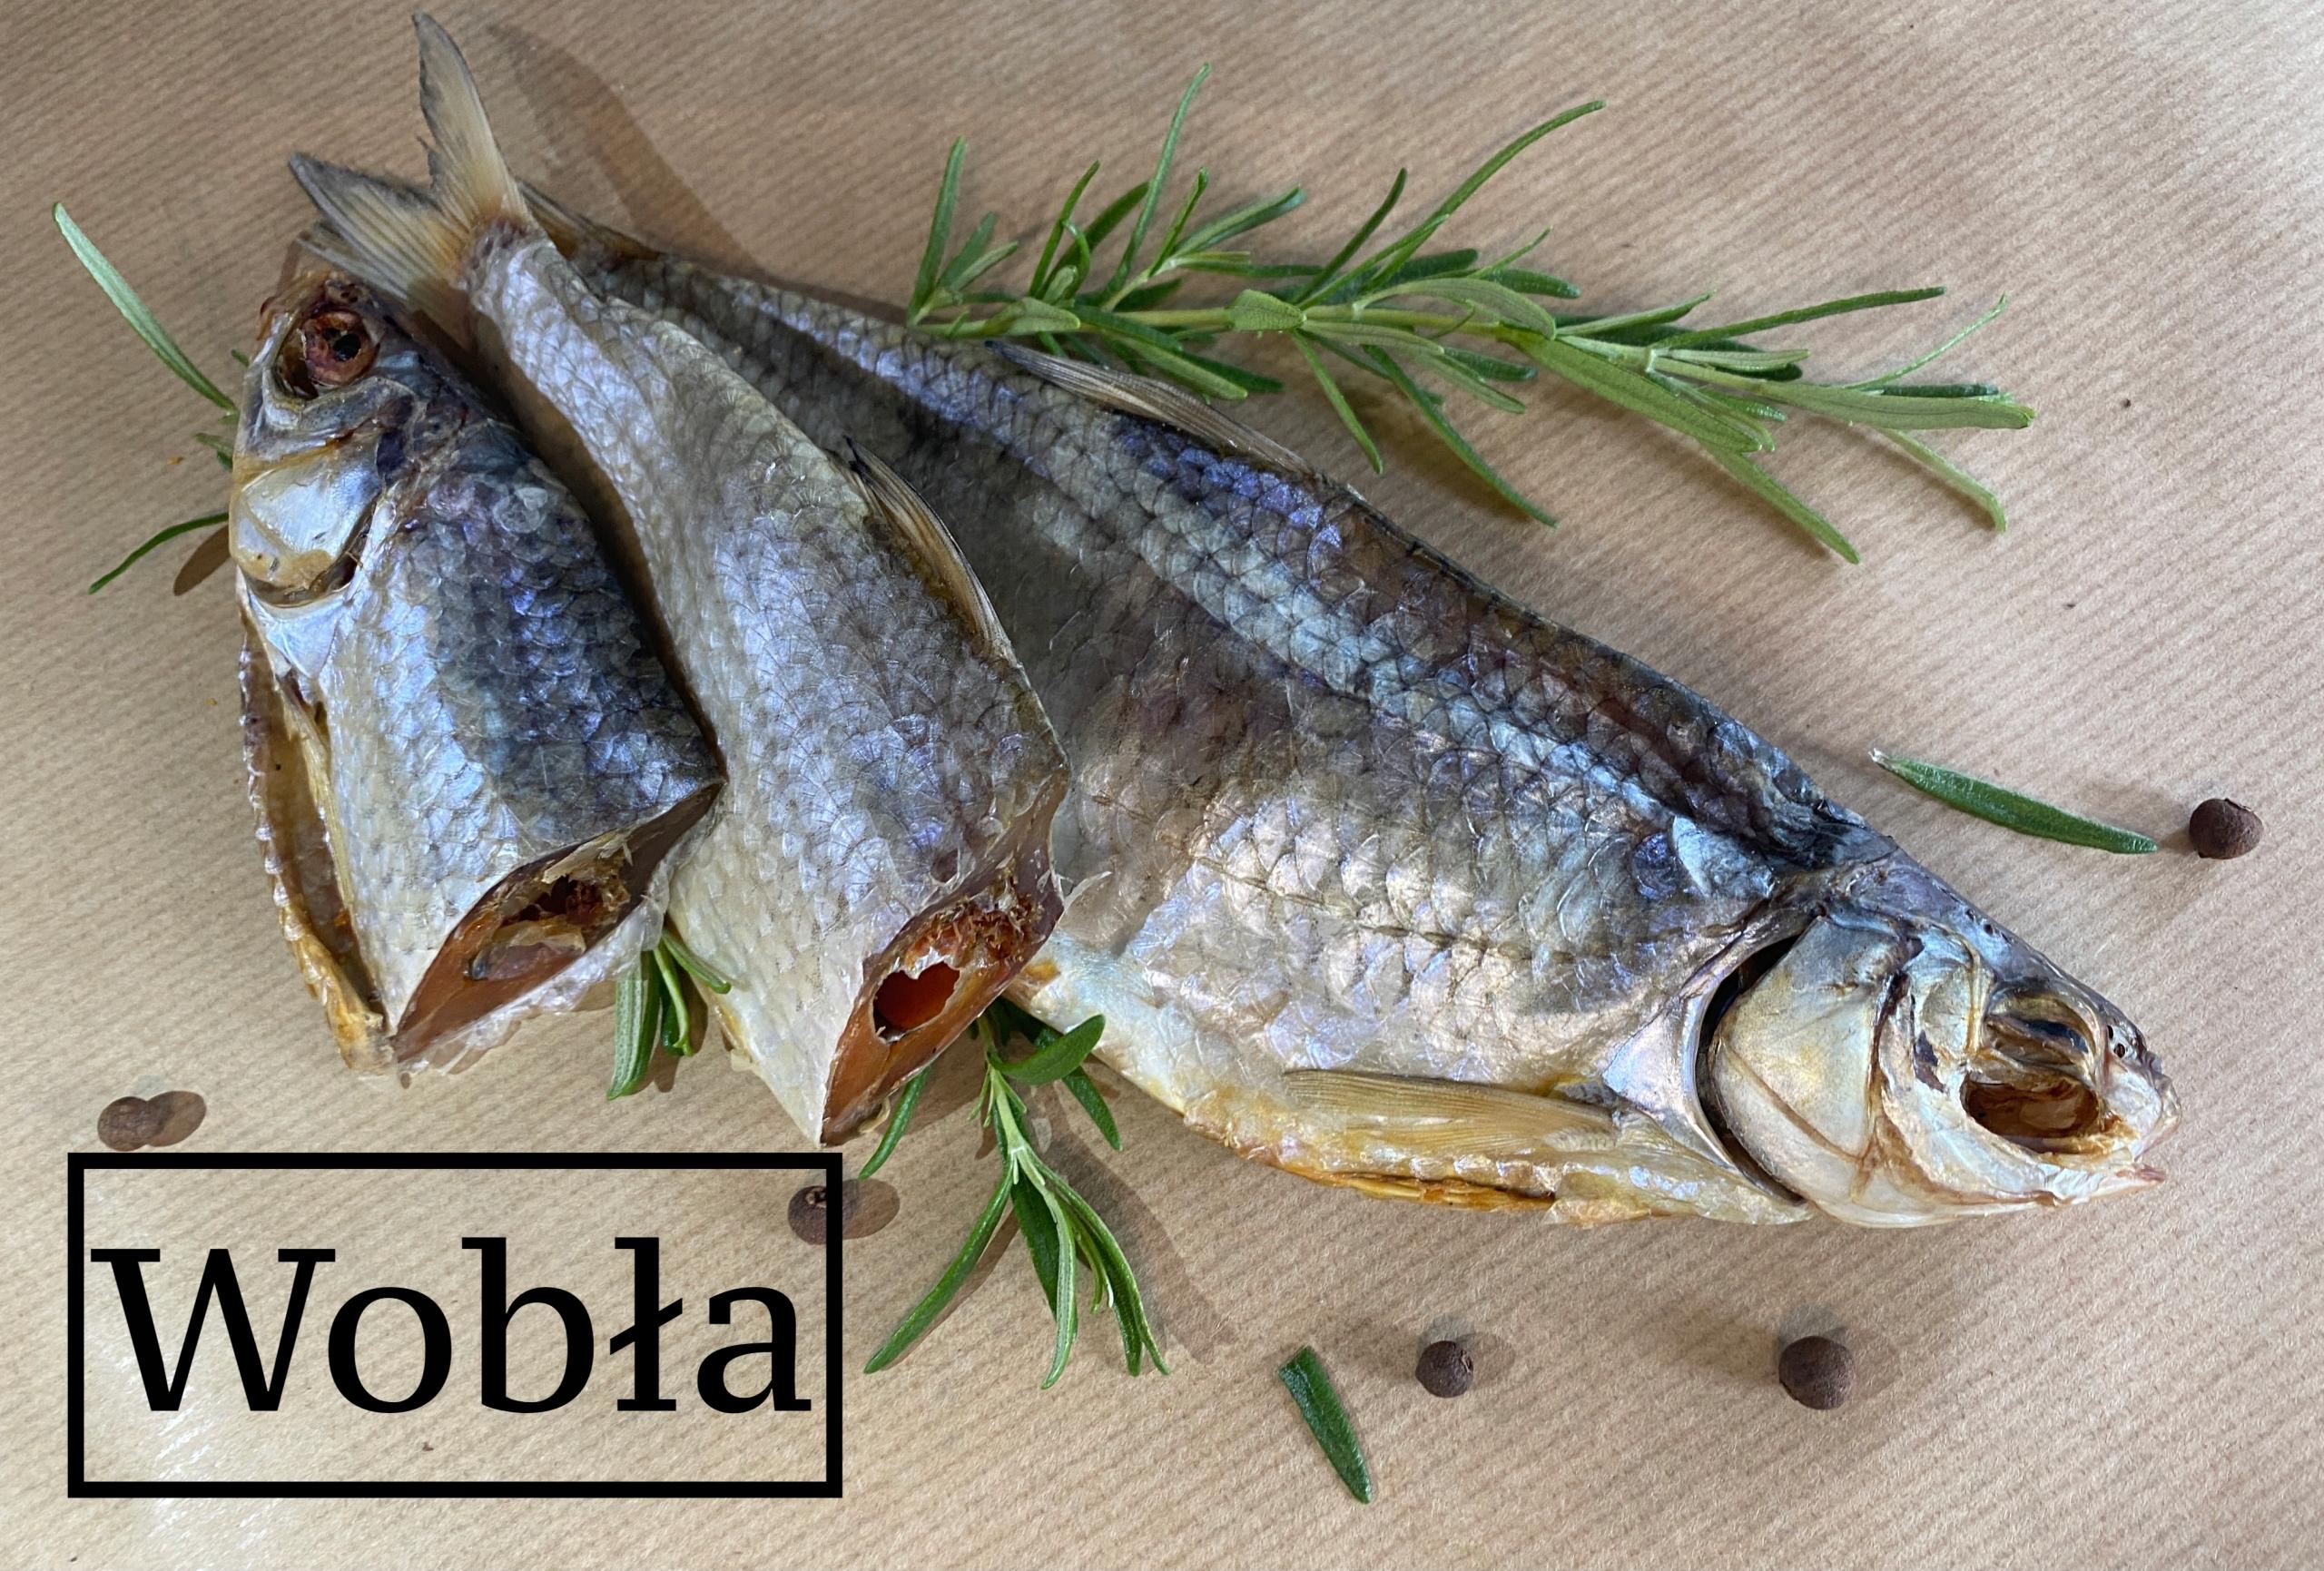 Вобла (каспийская плотва) Сушеная рыба 200 +/- 10 г x 50 шт.